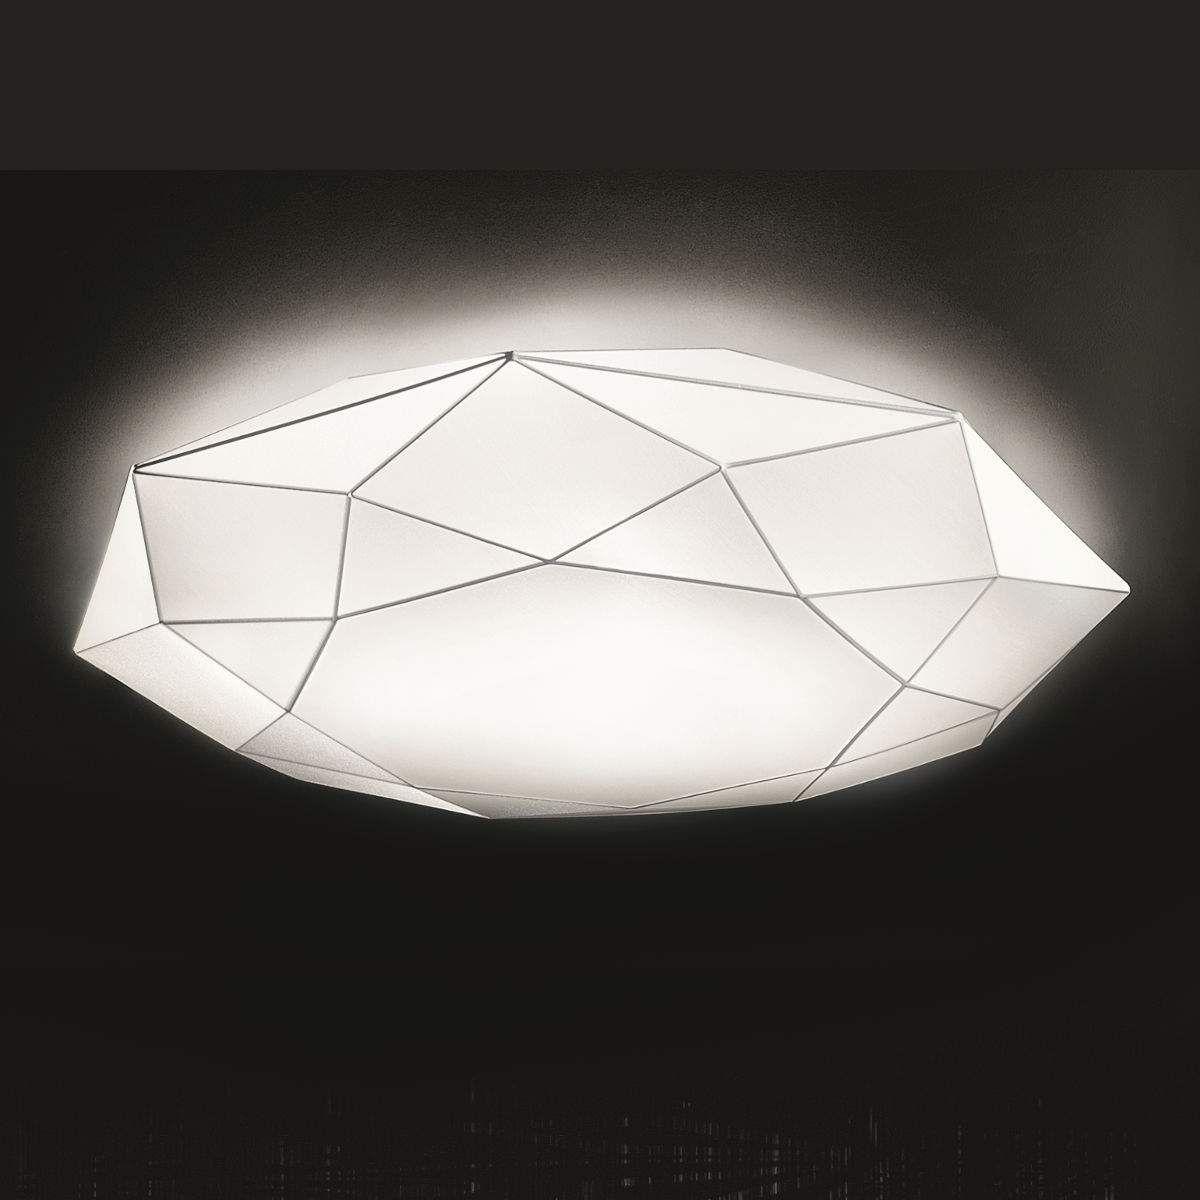 Led Deckenleuchte Dimmbar Farbwechsel Kuchen Deckenlampe Deckenleuchten Wohnzimmer Led Led Deckenbel Lampen Lampen Und Leuchten Led Deckenleuchte Dimmbar